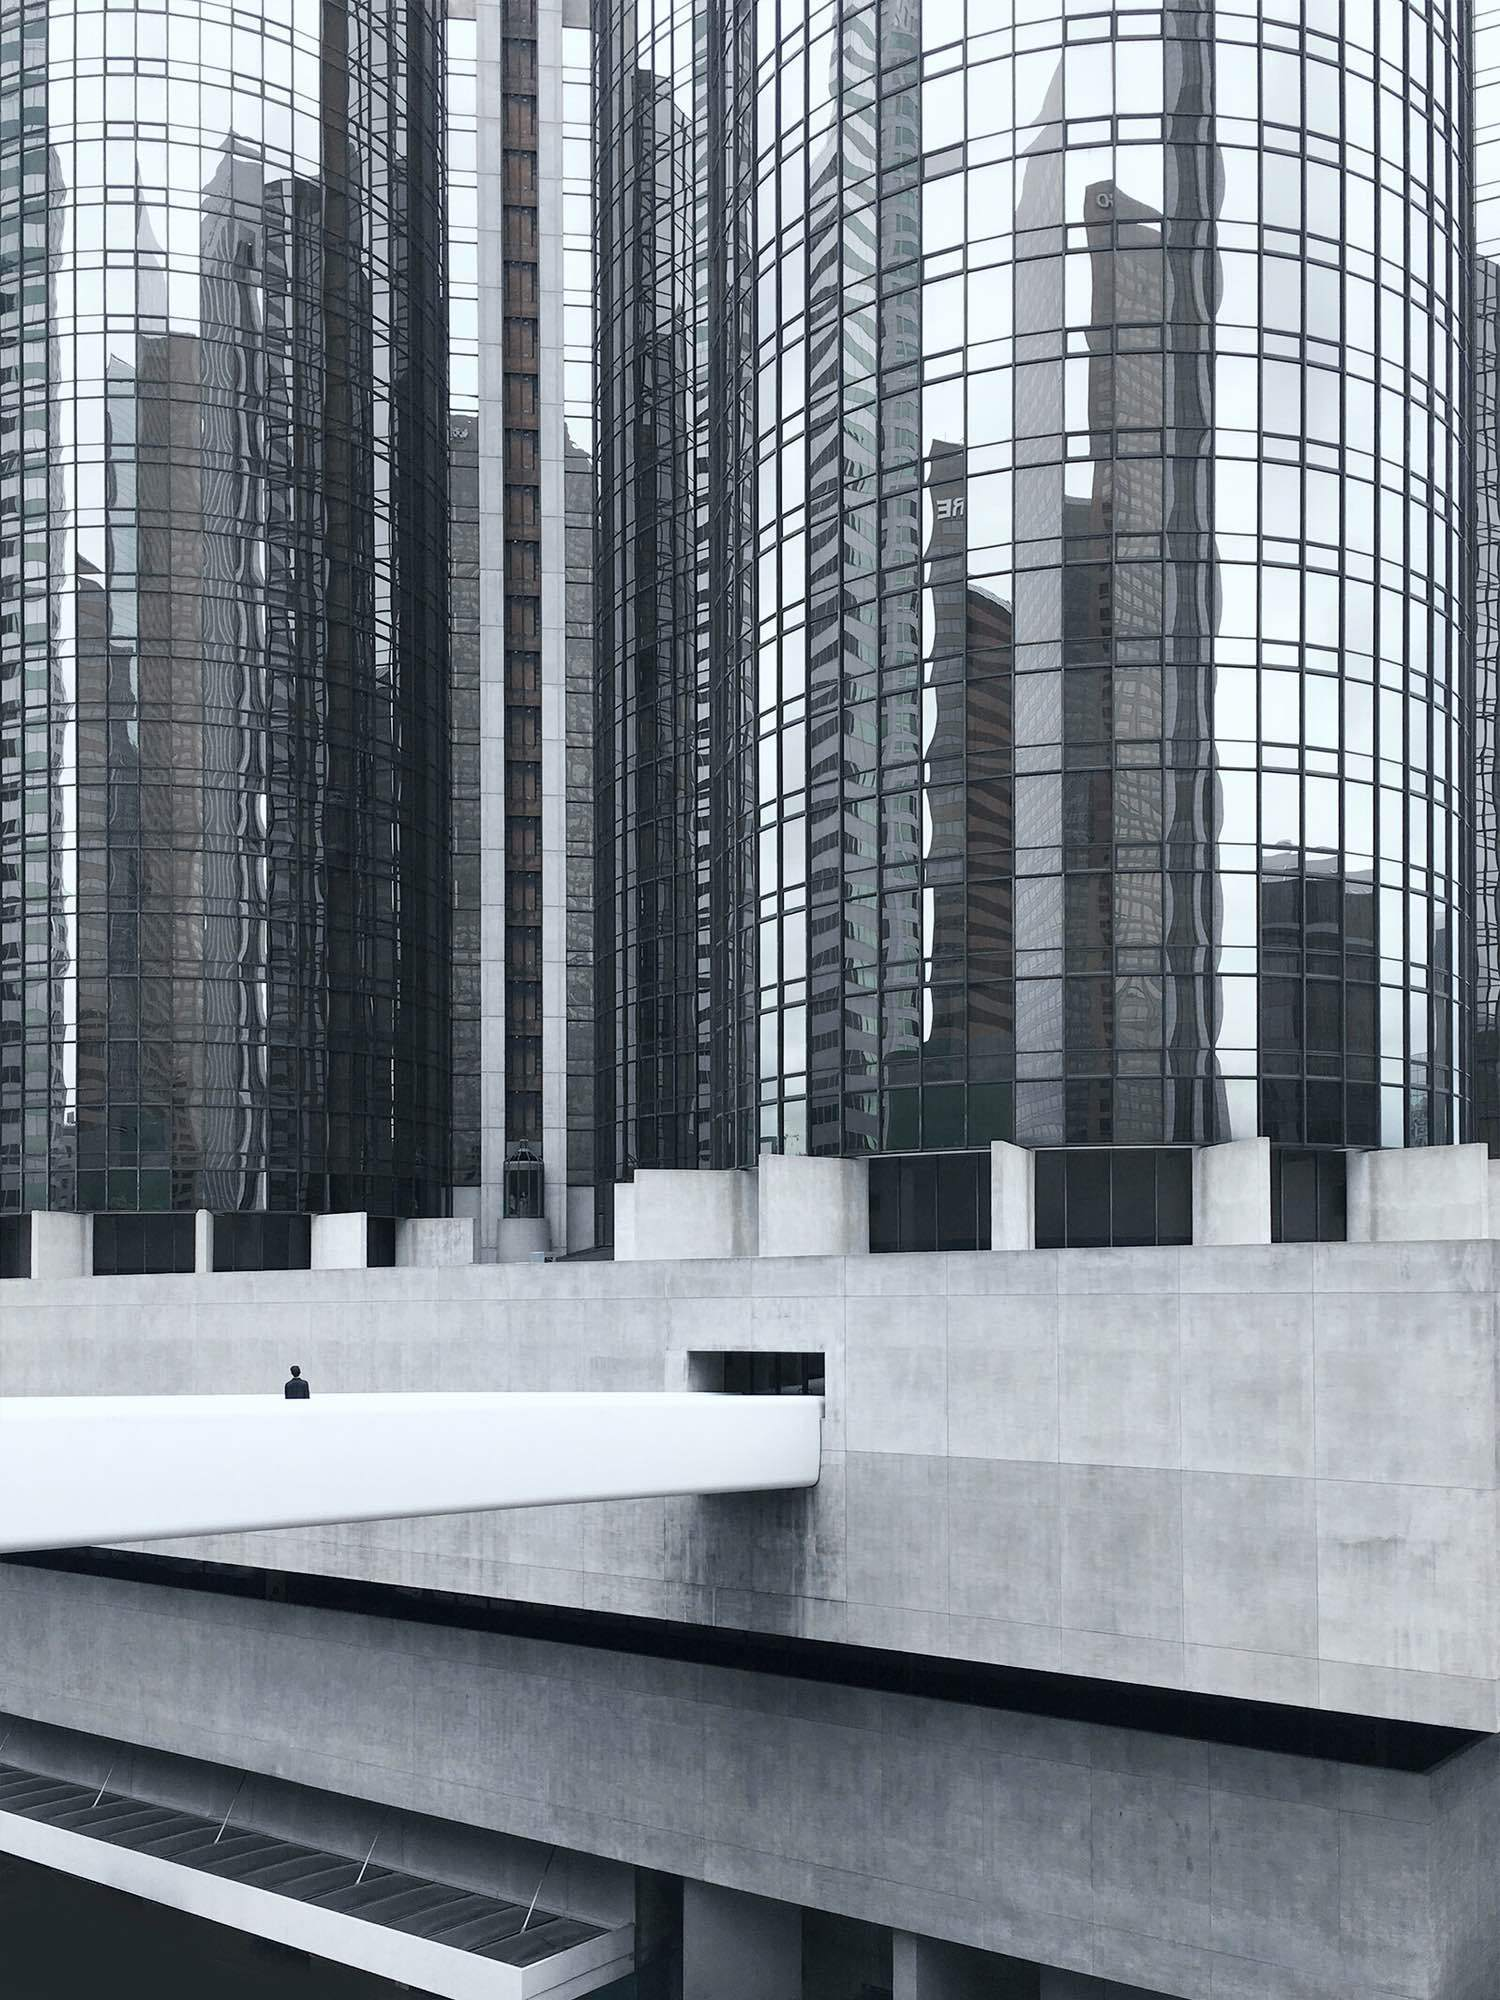 Minimalist Architecture 8